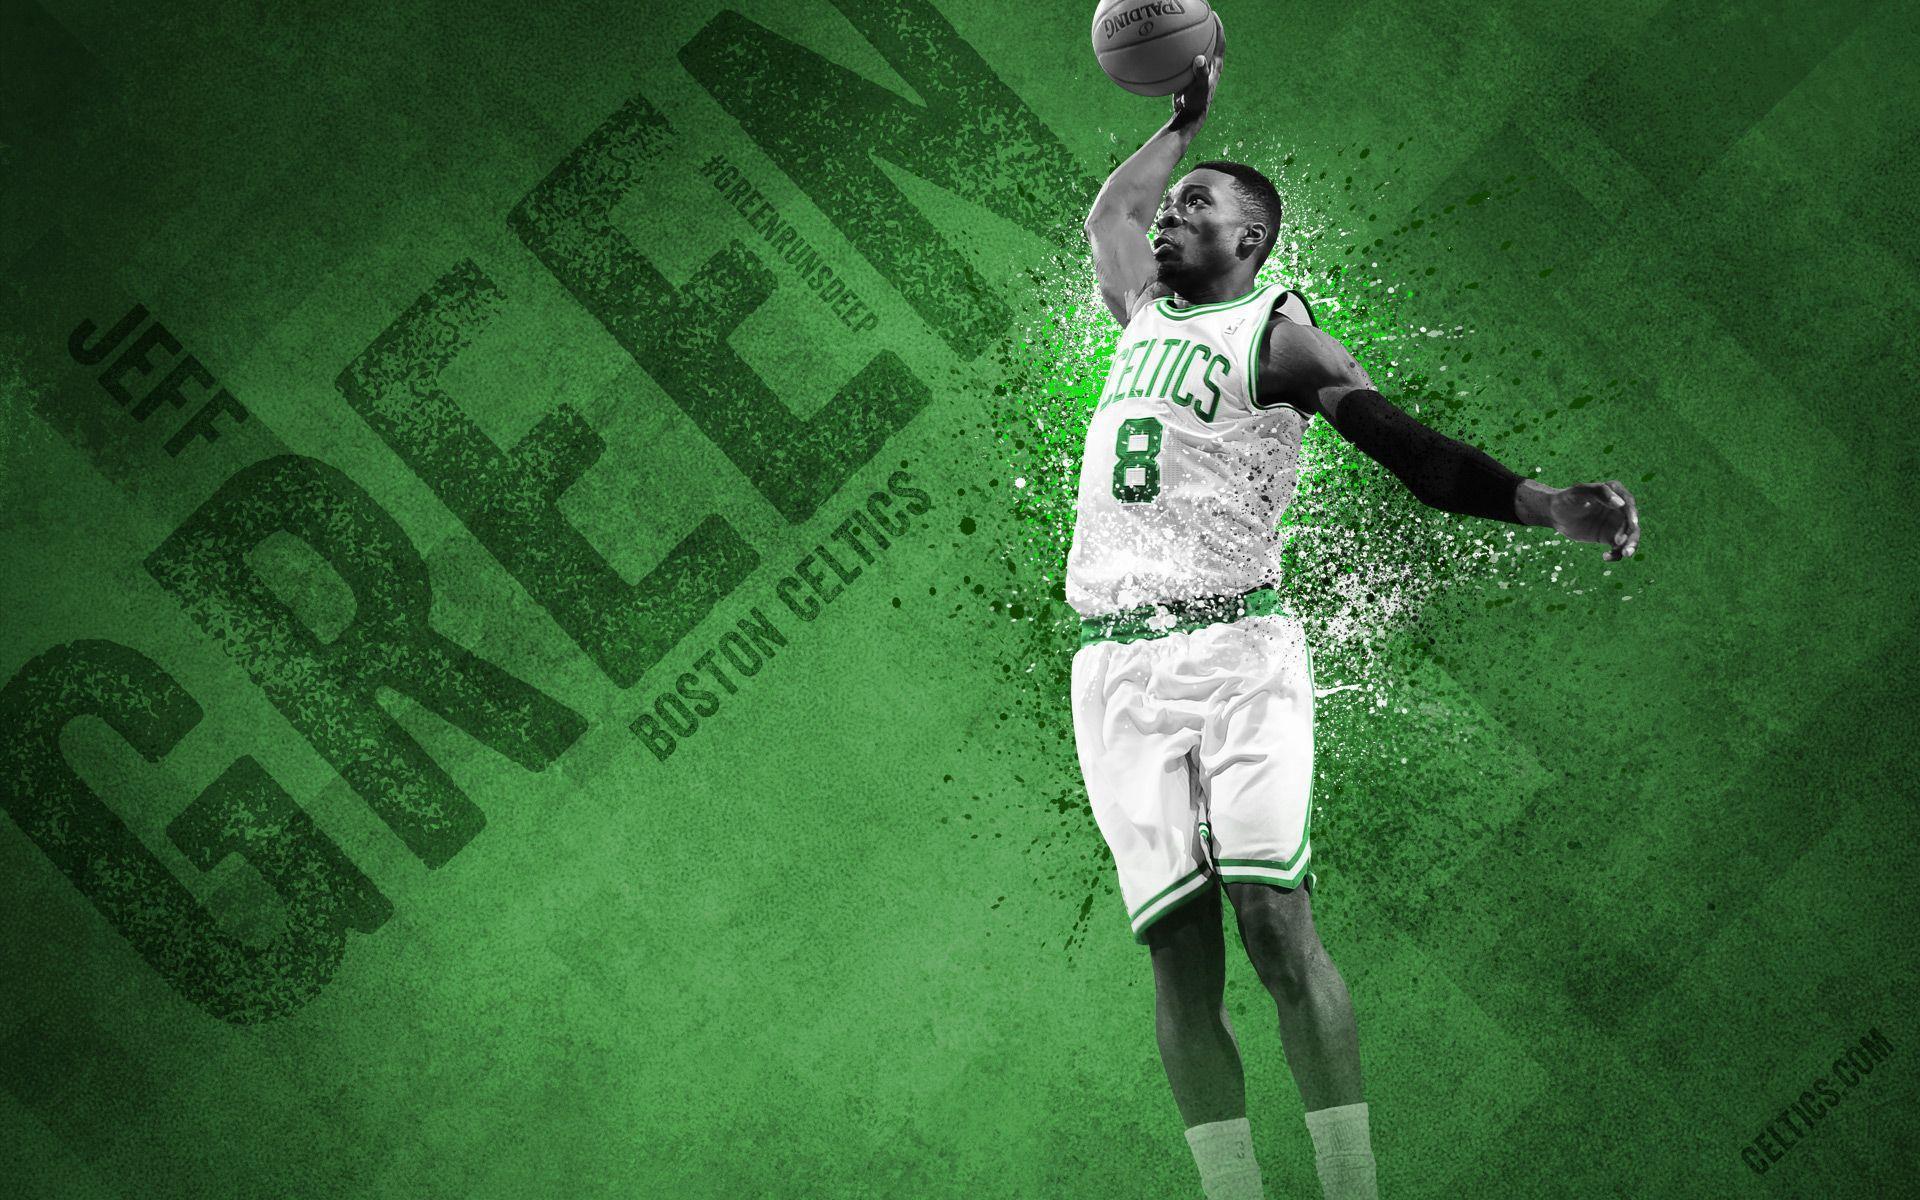 Kyrie Irving Boston Celtics Wallpapers - Wallpaper Cave  |Boston Celtics Wallpaper